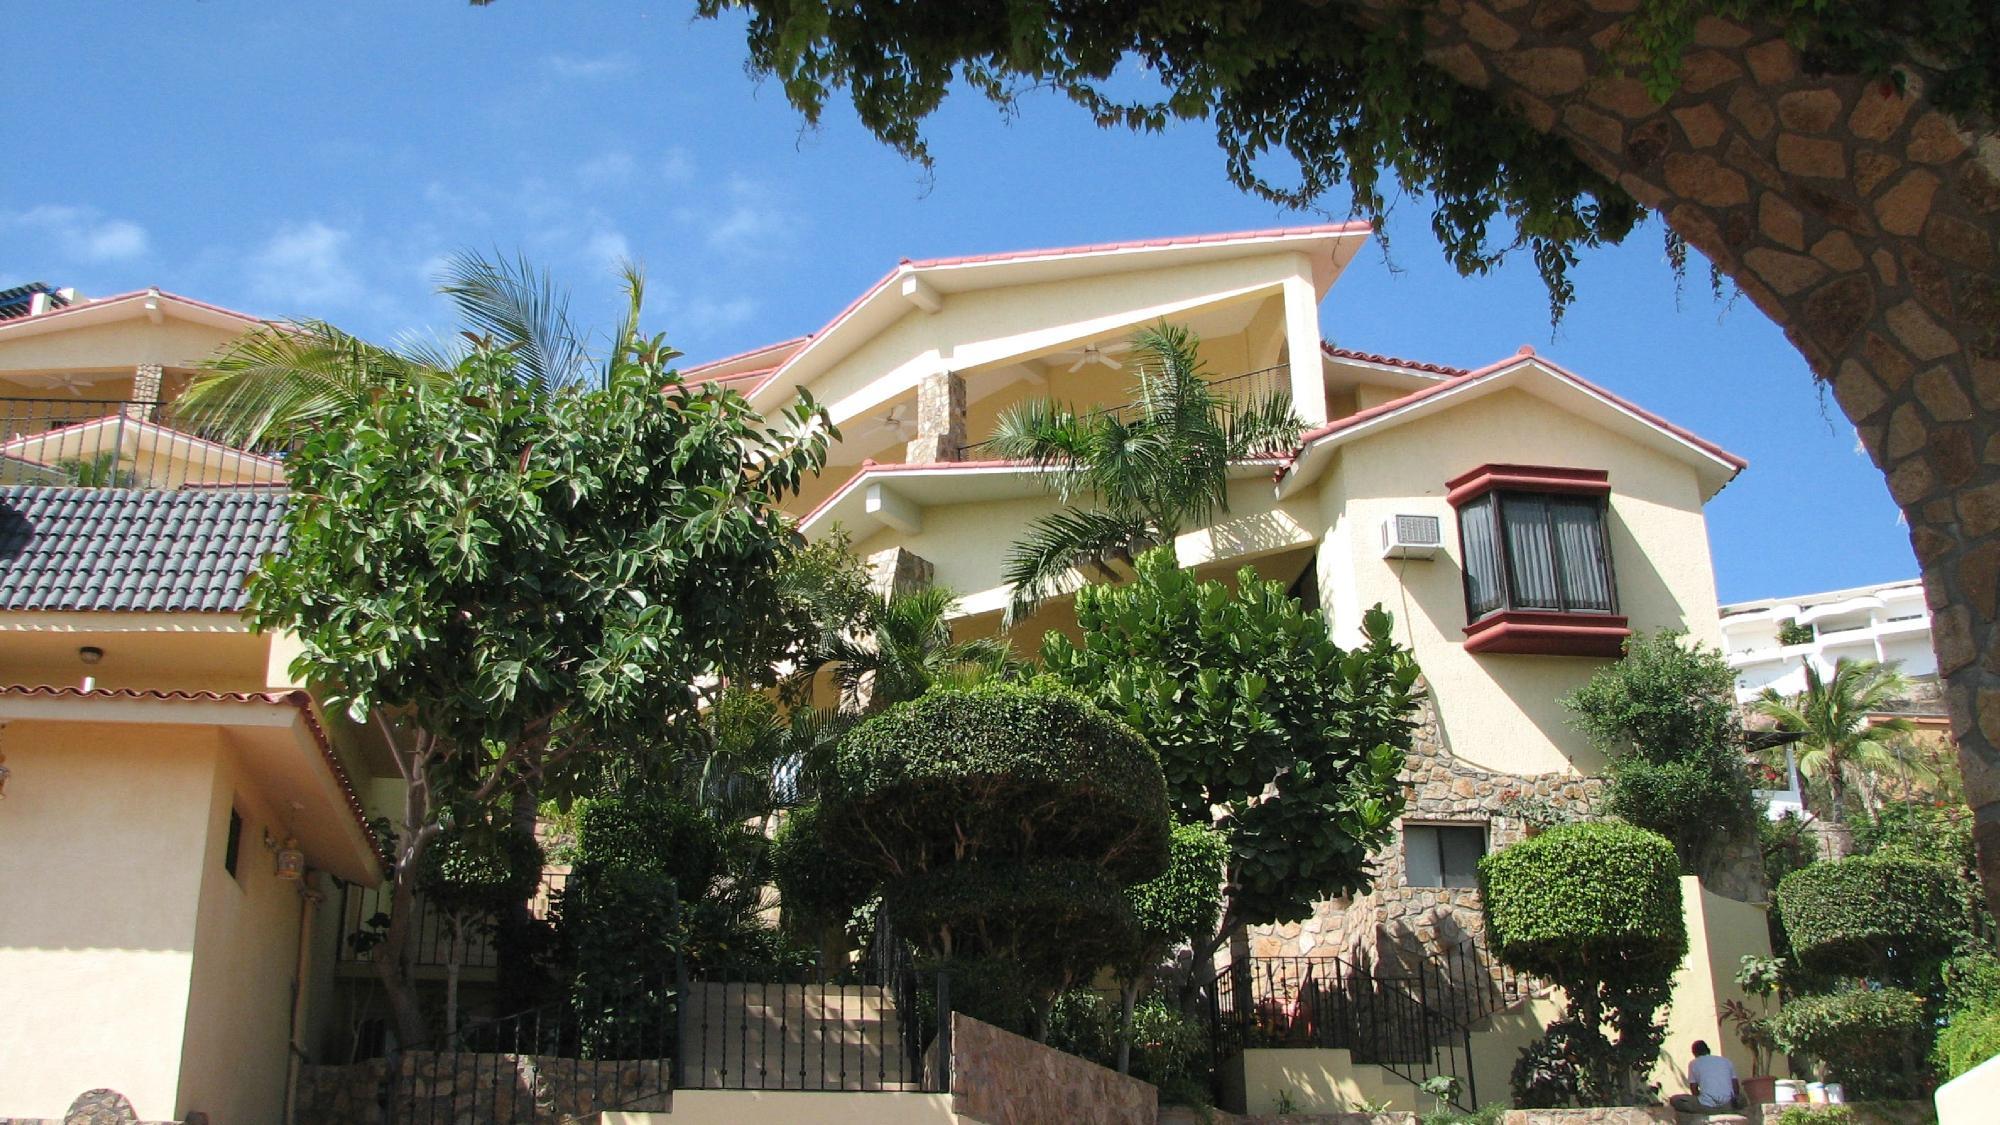 Portofino de Cabo Resort